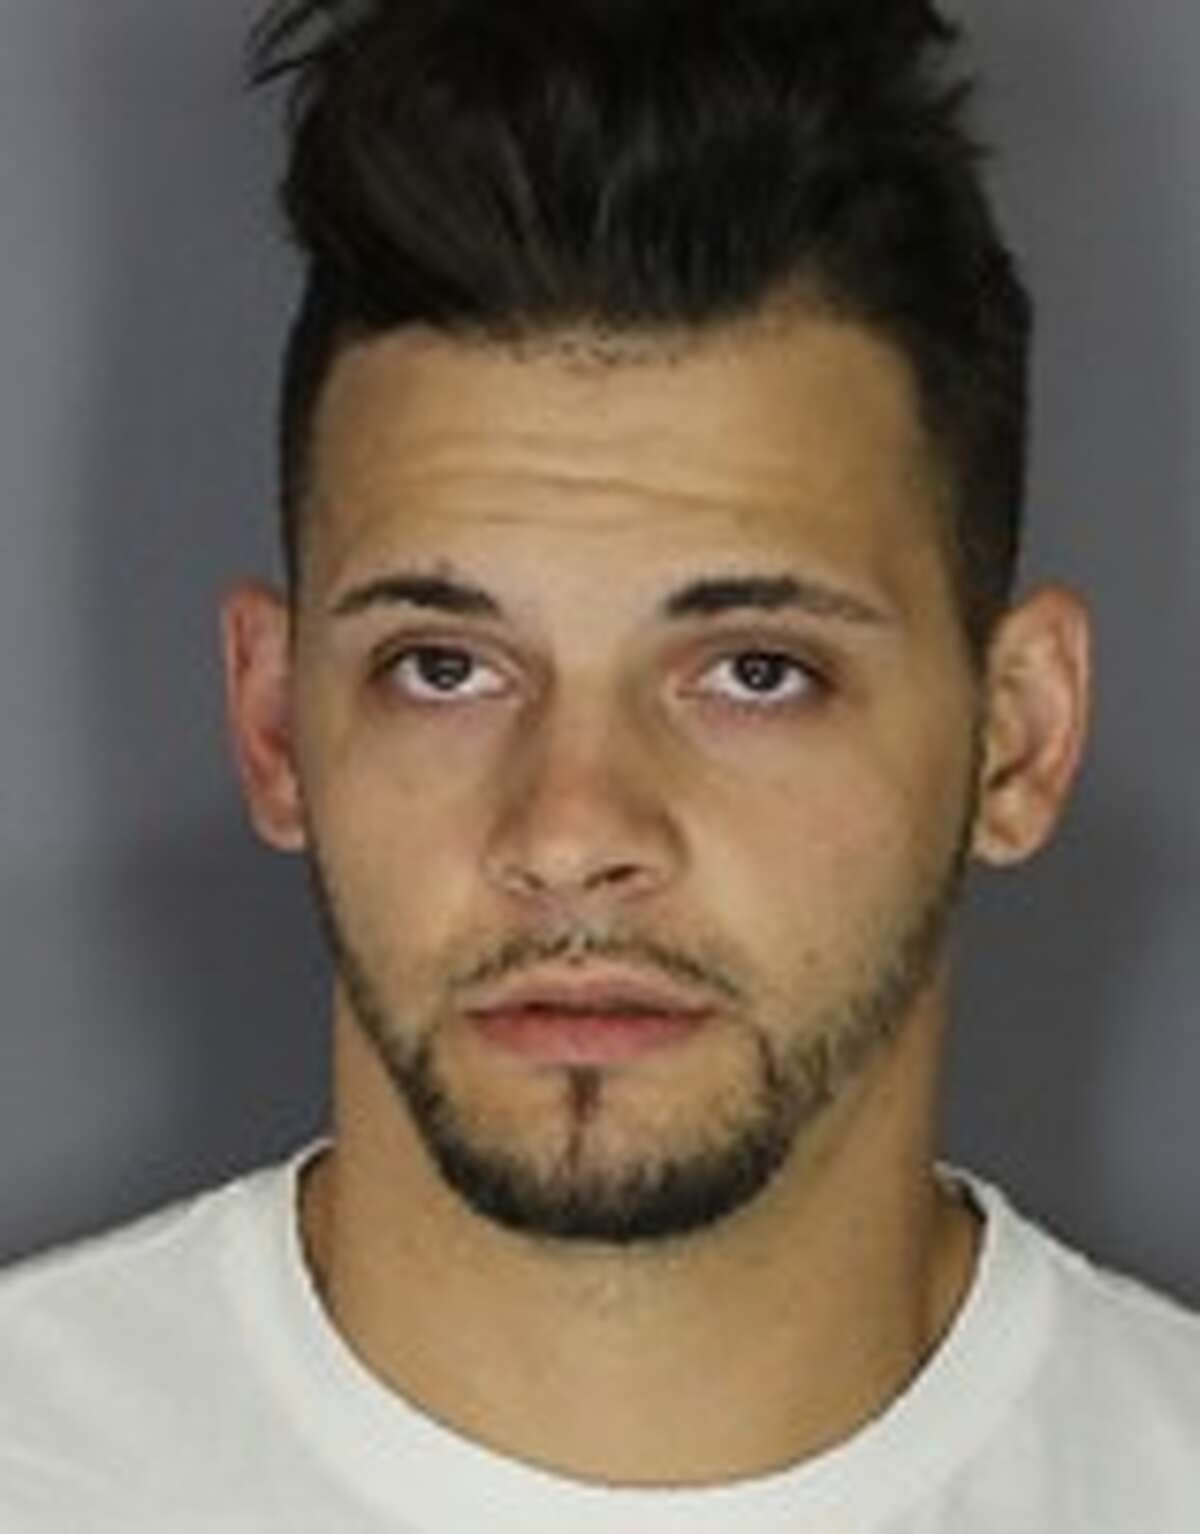 Daniel D. Dugan, 29. (Photo: Albany County Sheriff's Office).